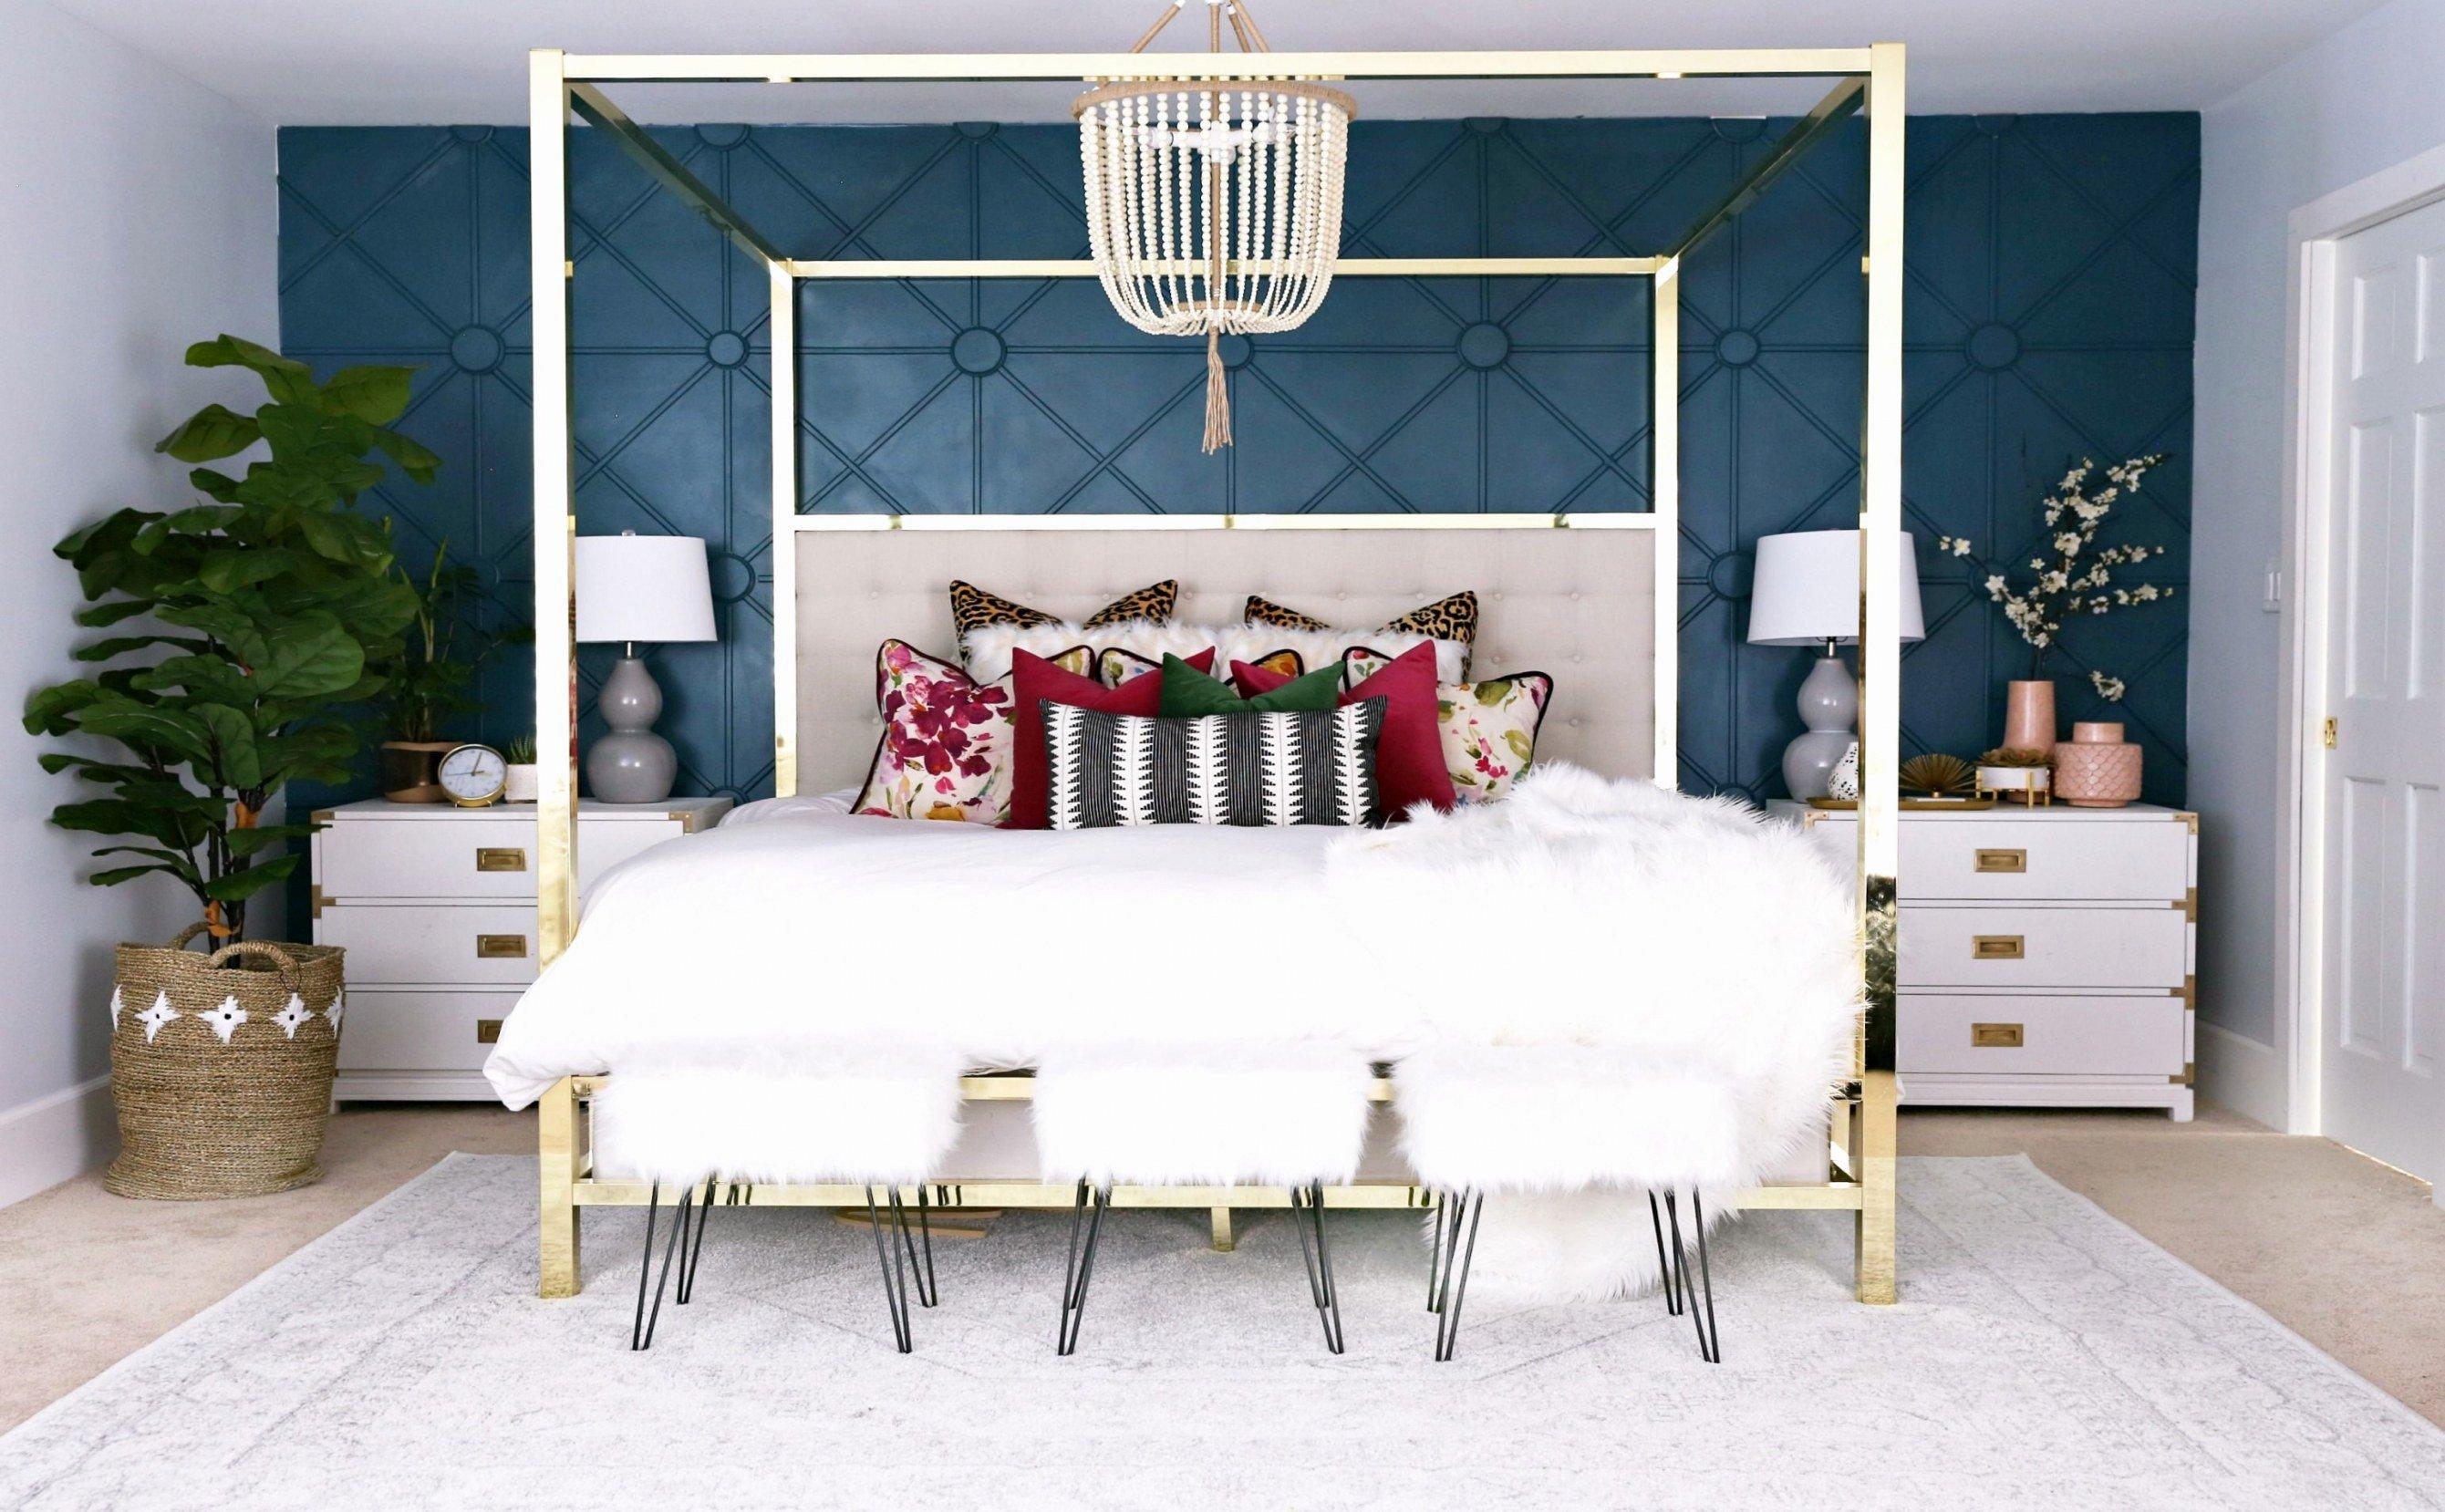 Small Master Bedroom Design Ideas Lovely Small Room Design Ideas Small Master Bedroom Layouts